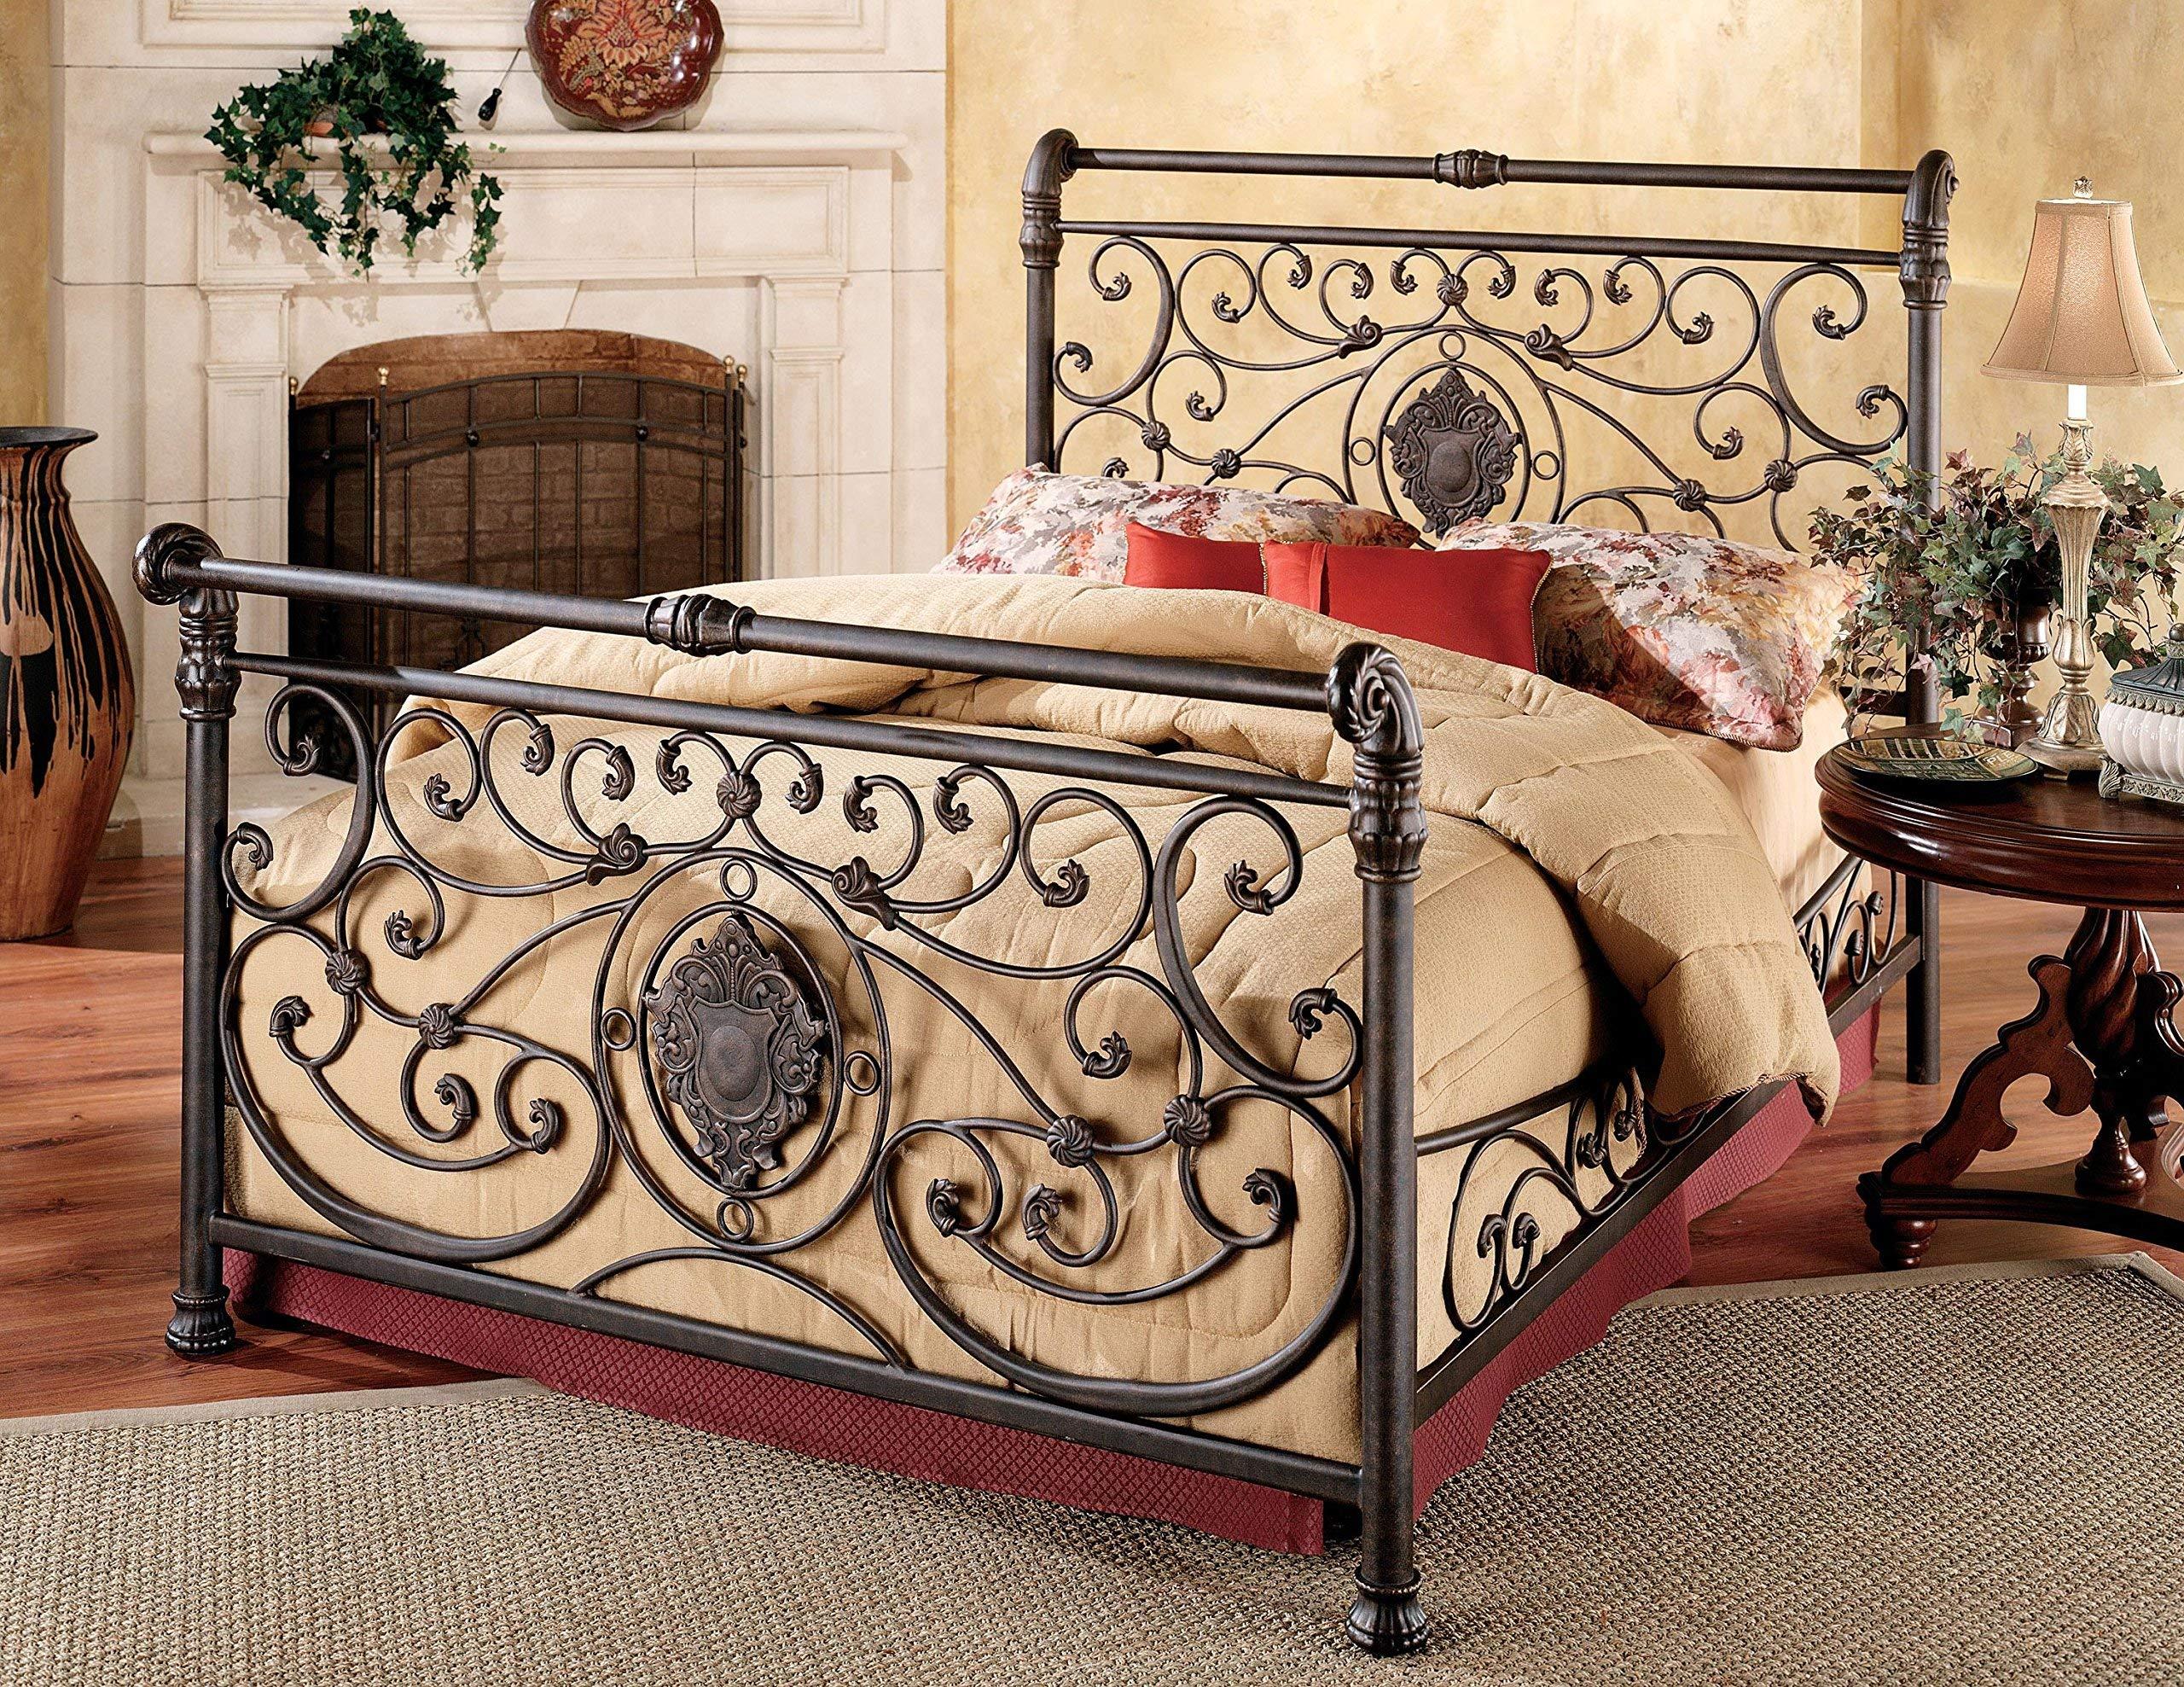 Hillsdale Furniture 1039BKR Mercer Bed Set with with Rails, King, Antique Brown